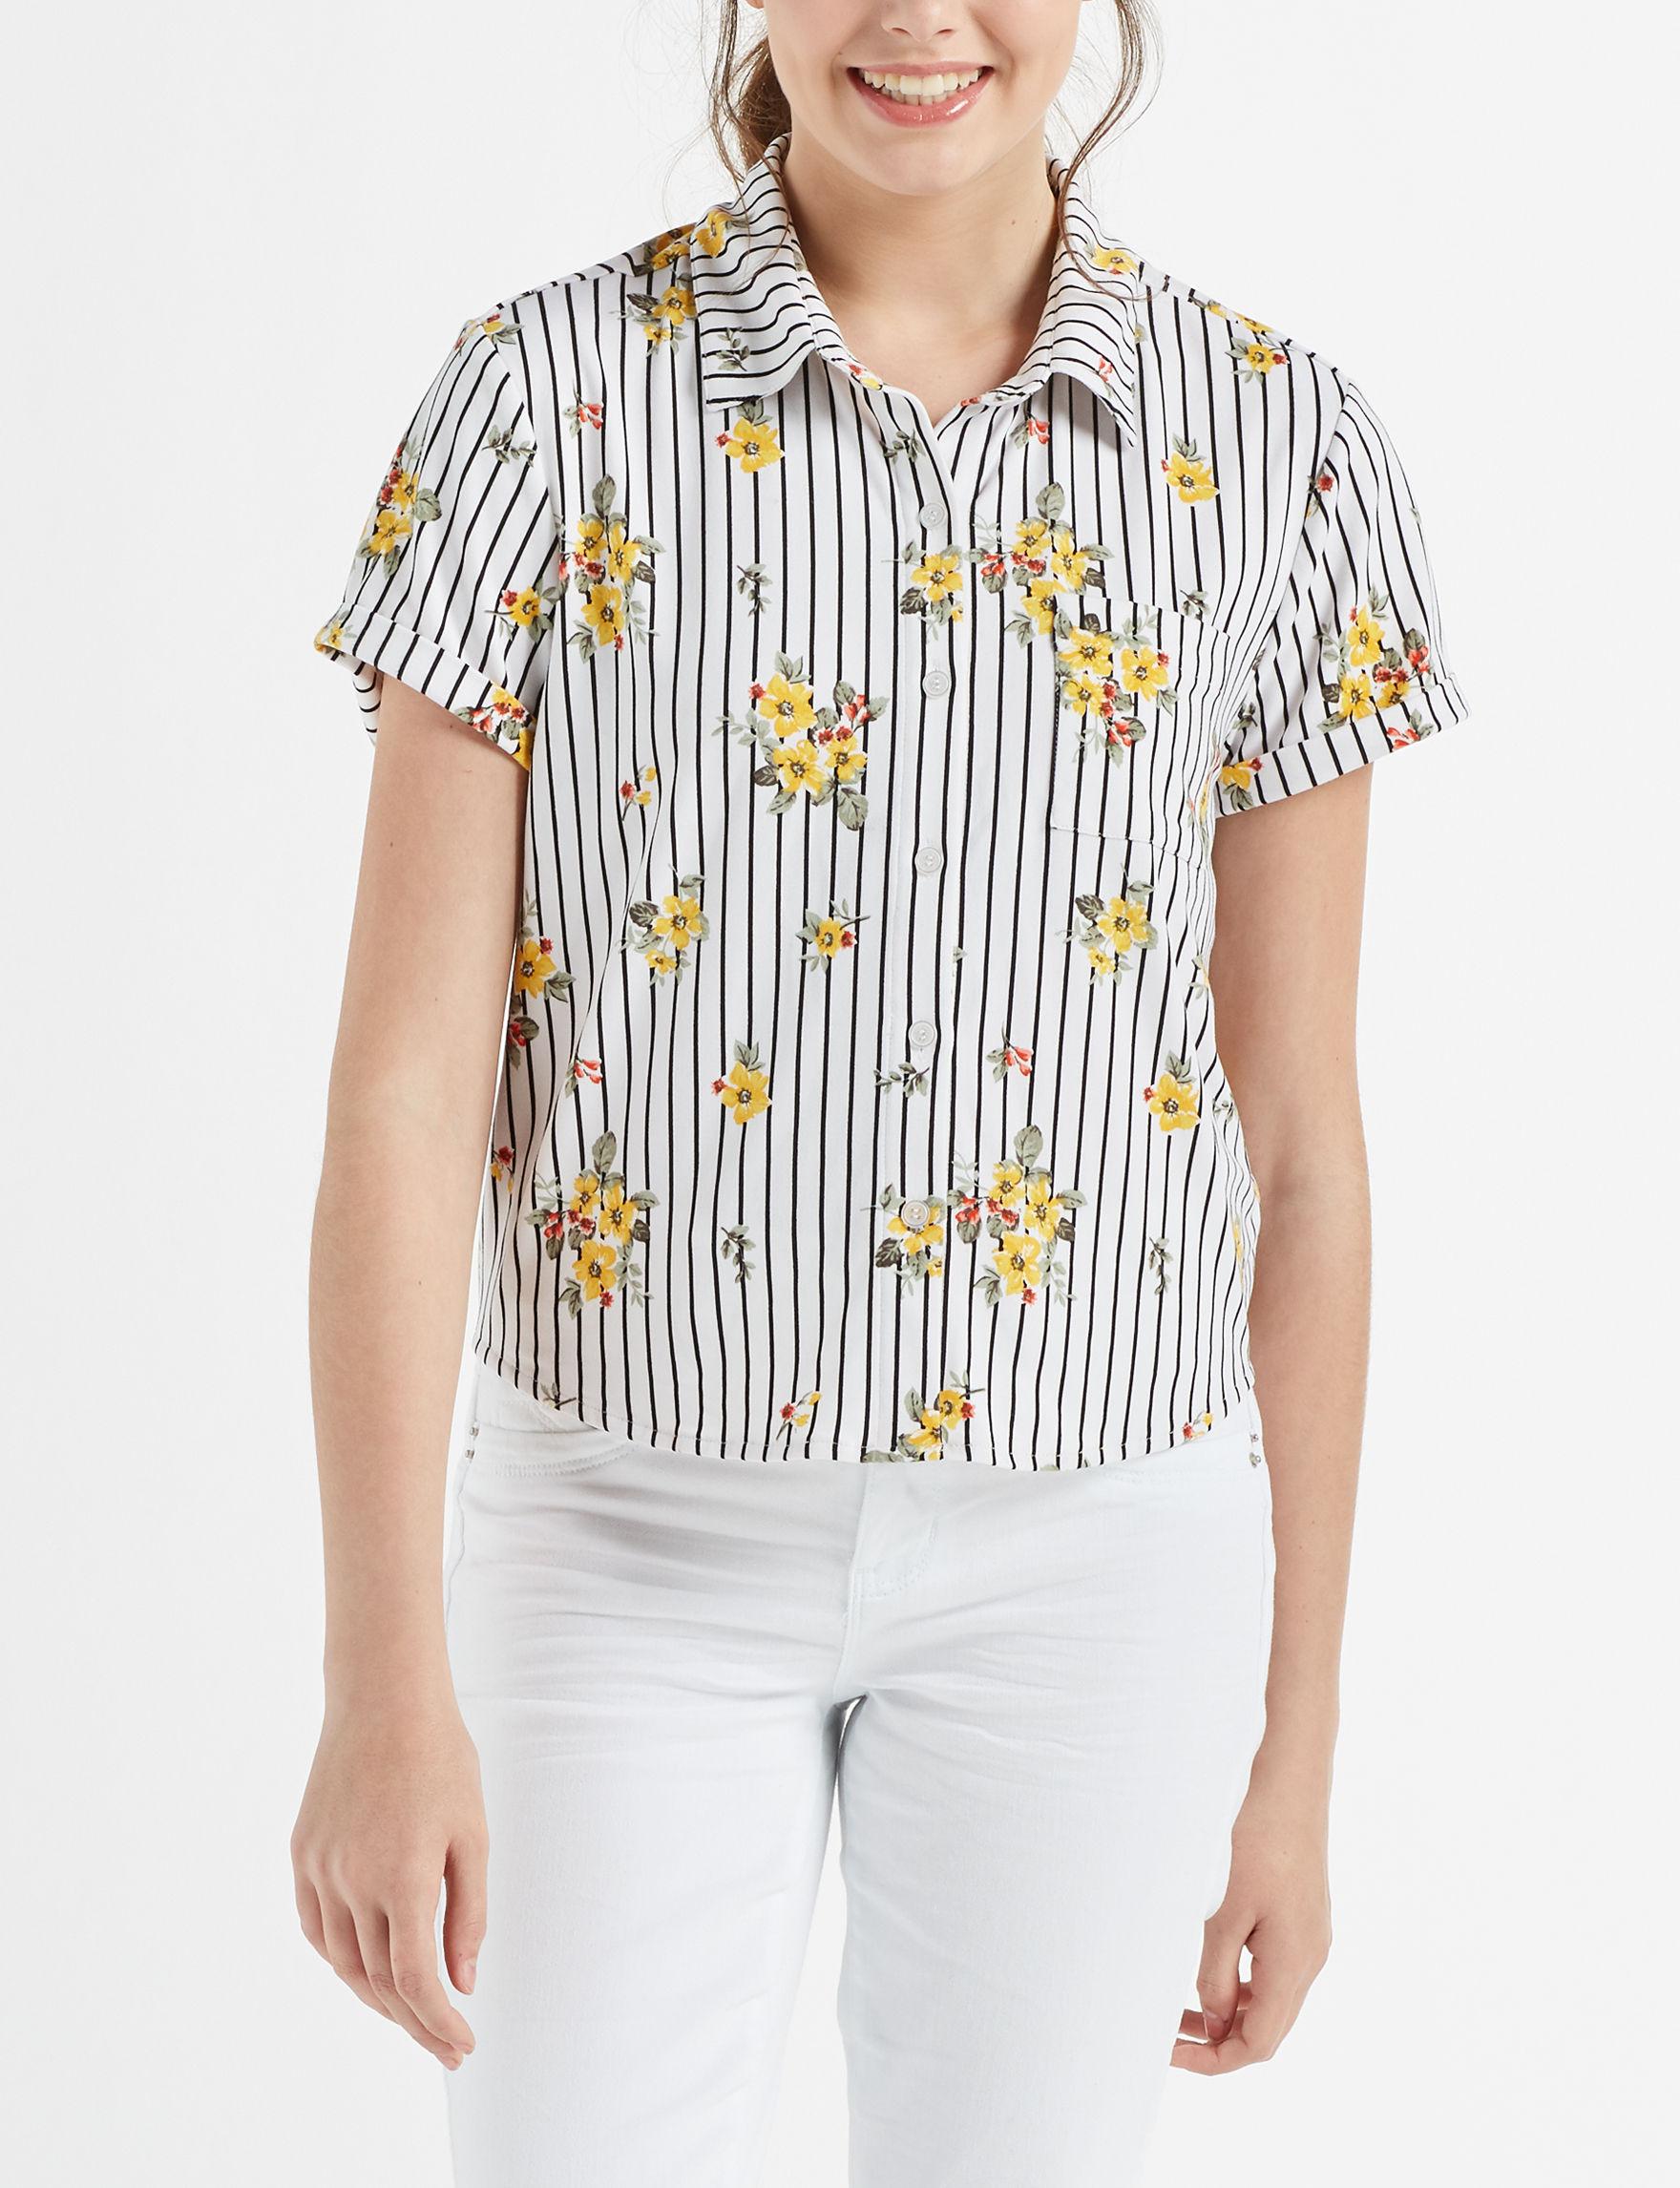 Ultra Flirt White Floral Shirts & Blouses